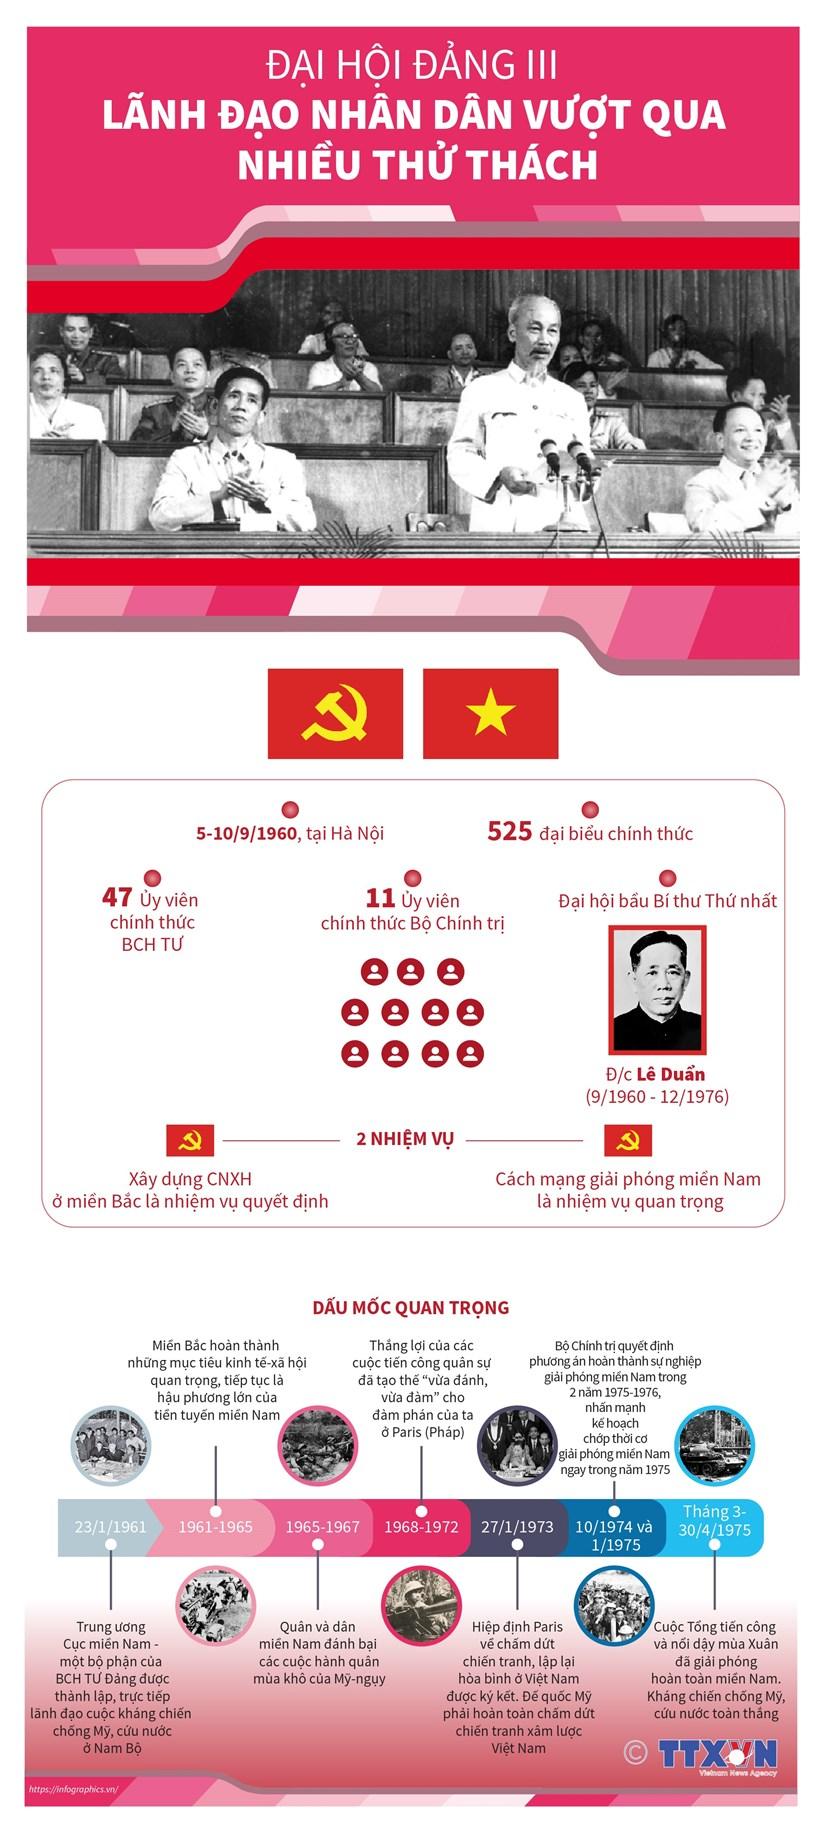 [Infographics] Dai hoi Dang III: Lanh dao nhan dan vuot qua thu thach hinh anh 1